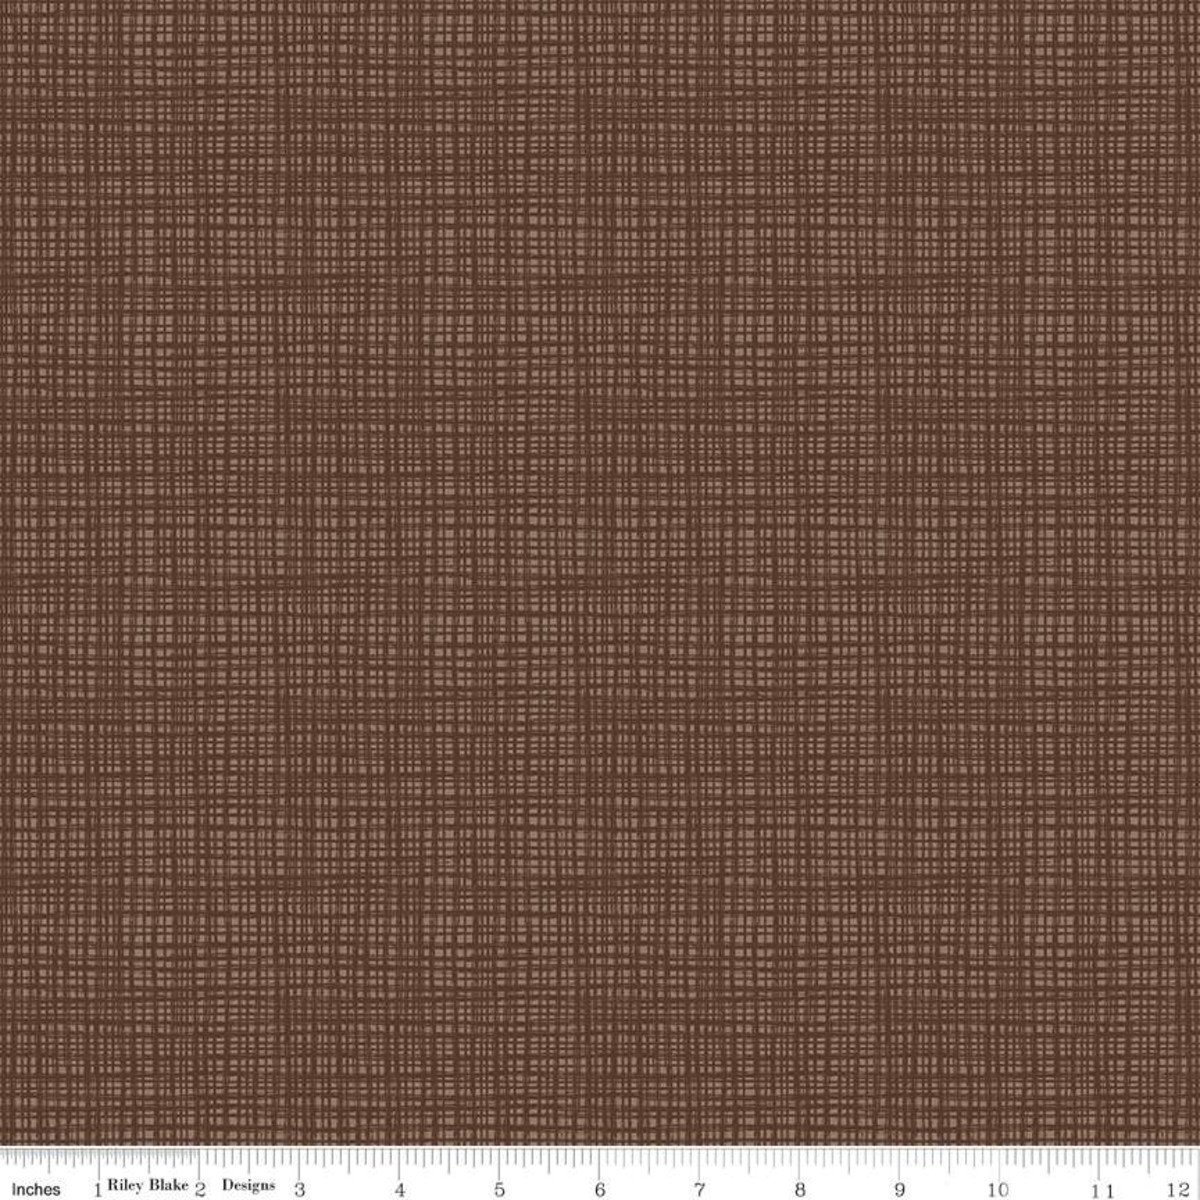 Texture Chocolate C610